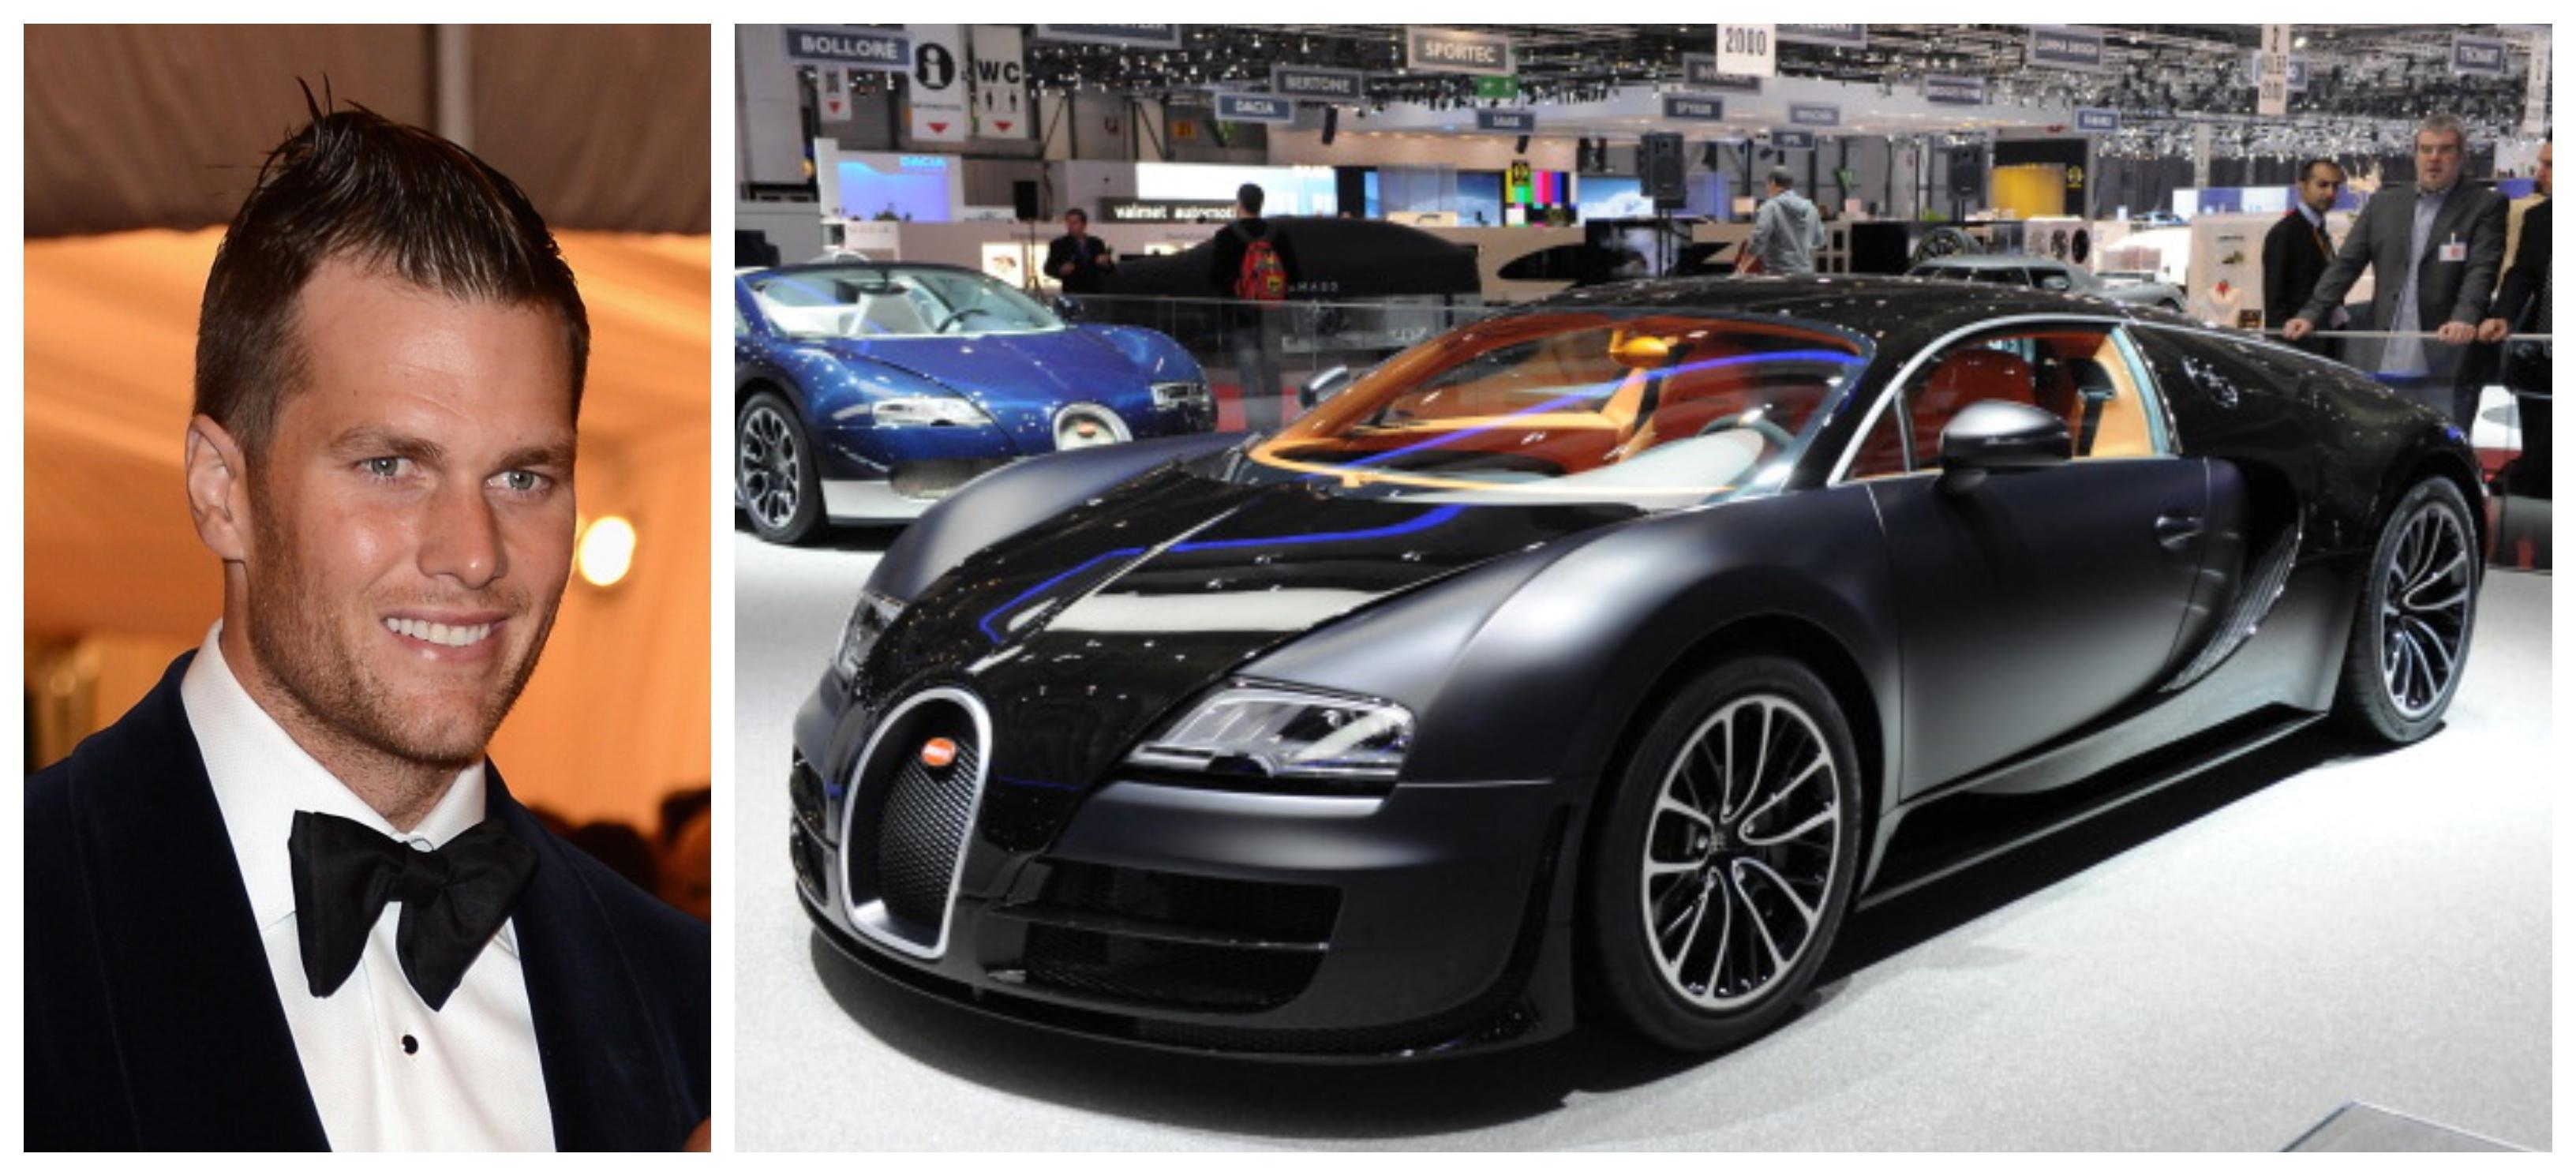 Cristiano Ronaldo – Bugatti Veyron, Estimated $2.5 Million